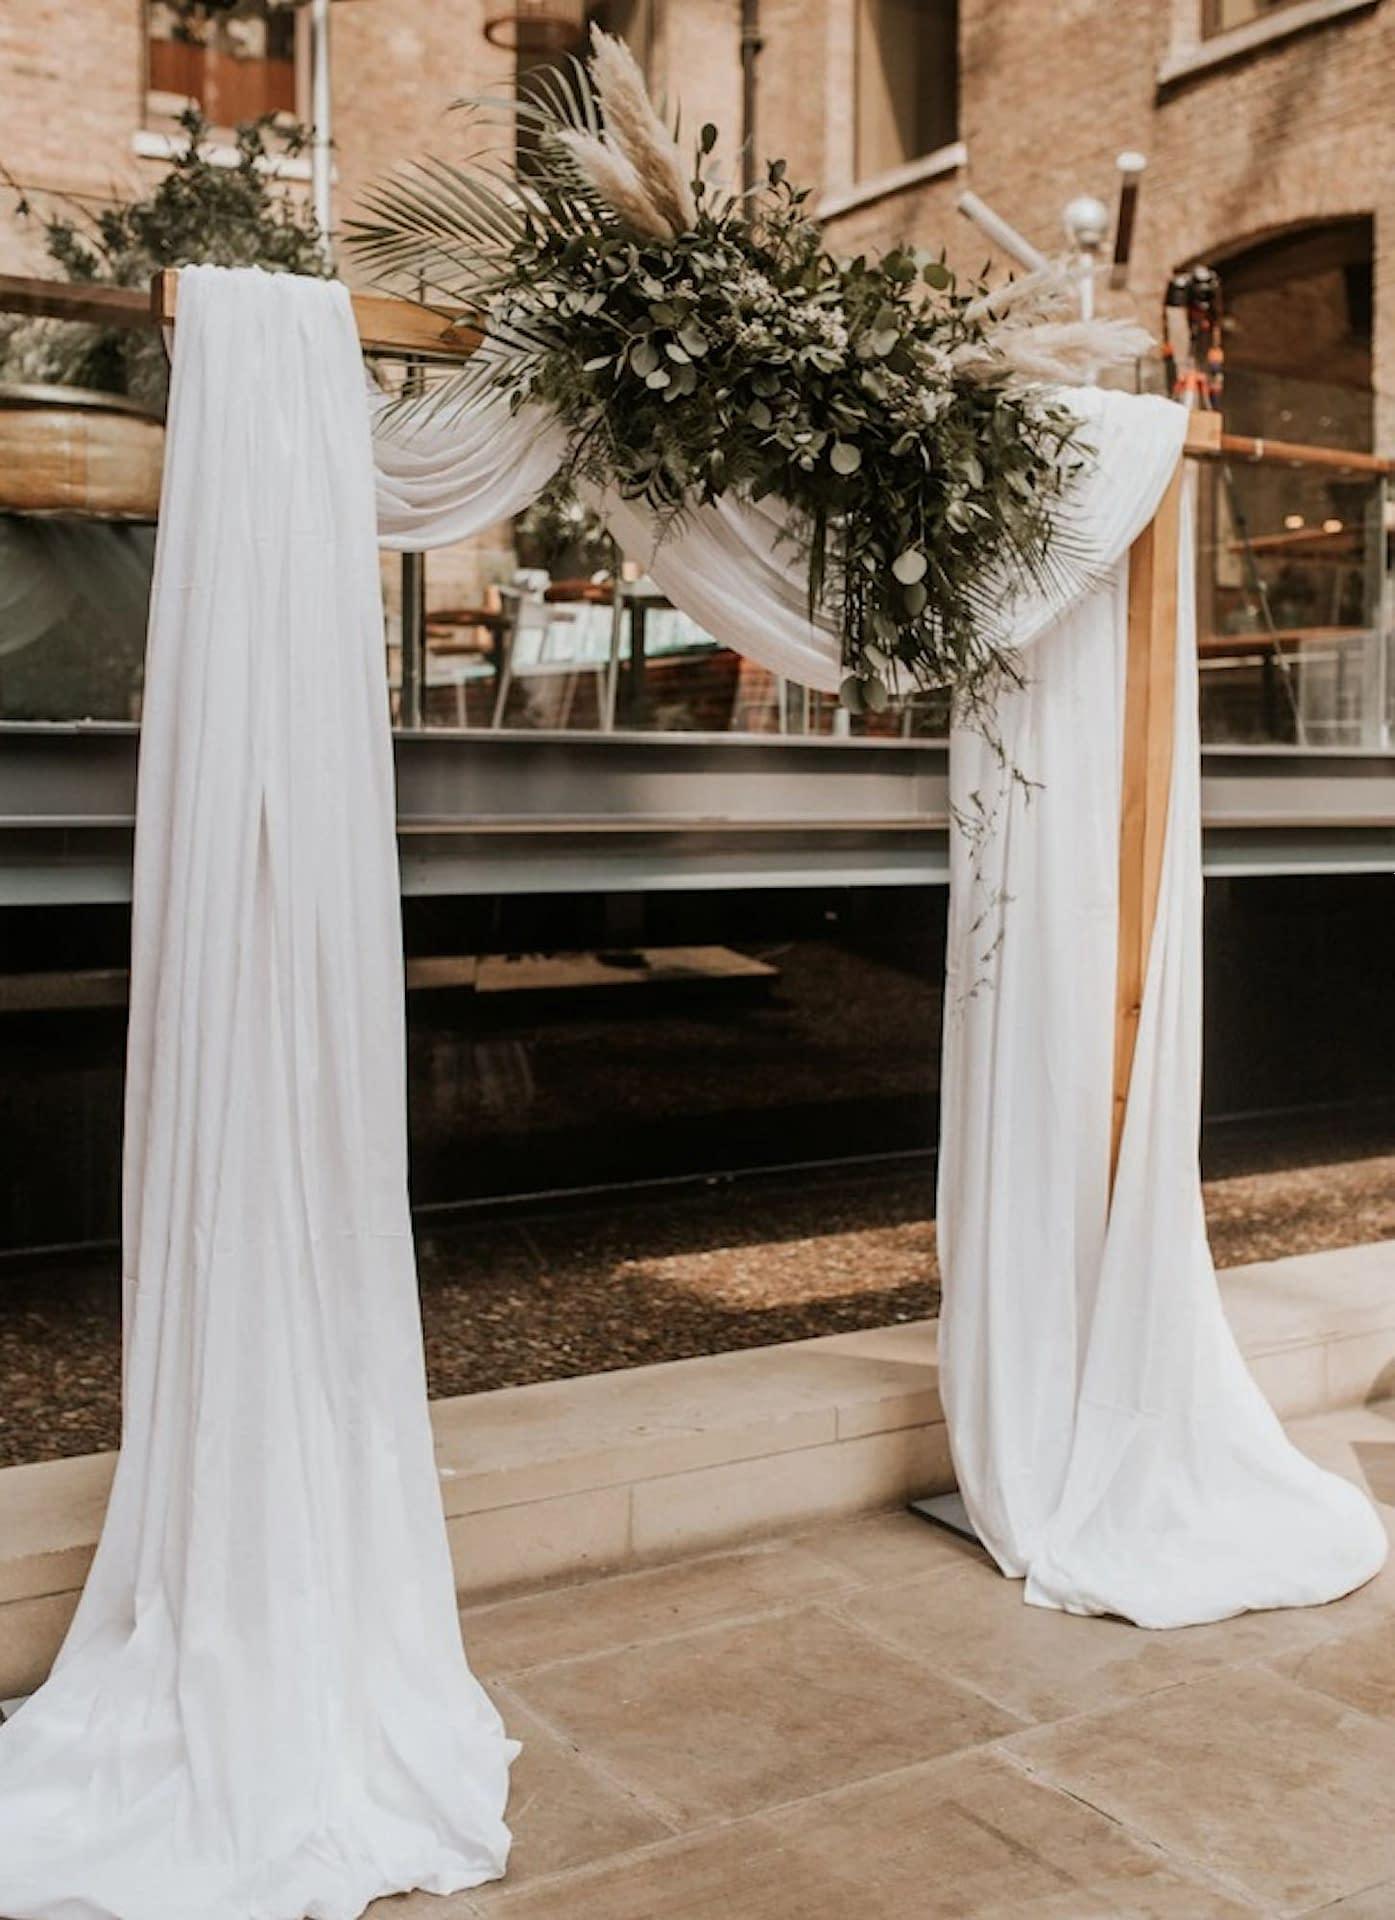 Muslin ceremony backdrop at Devonshire Terrace, London wedding venue